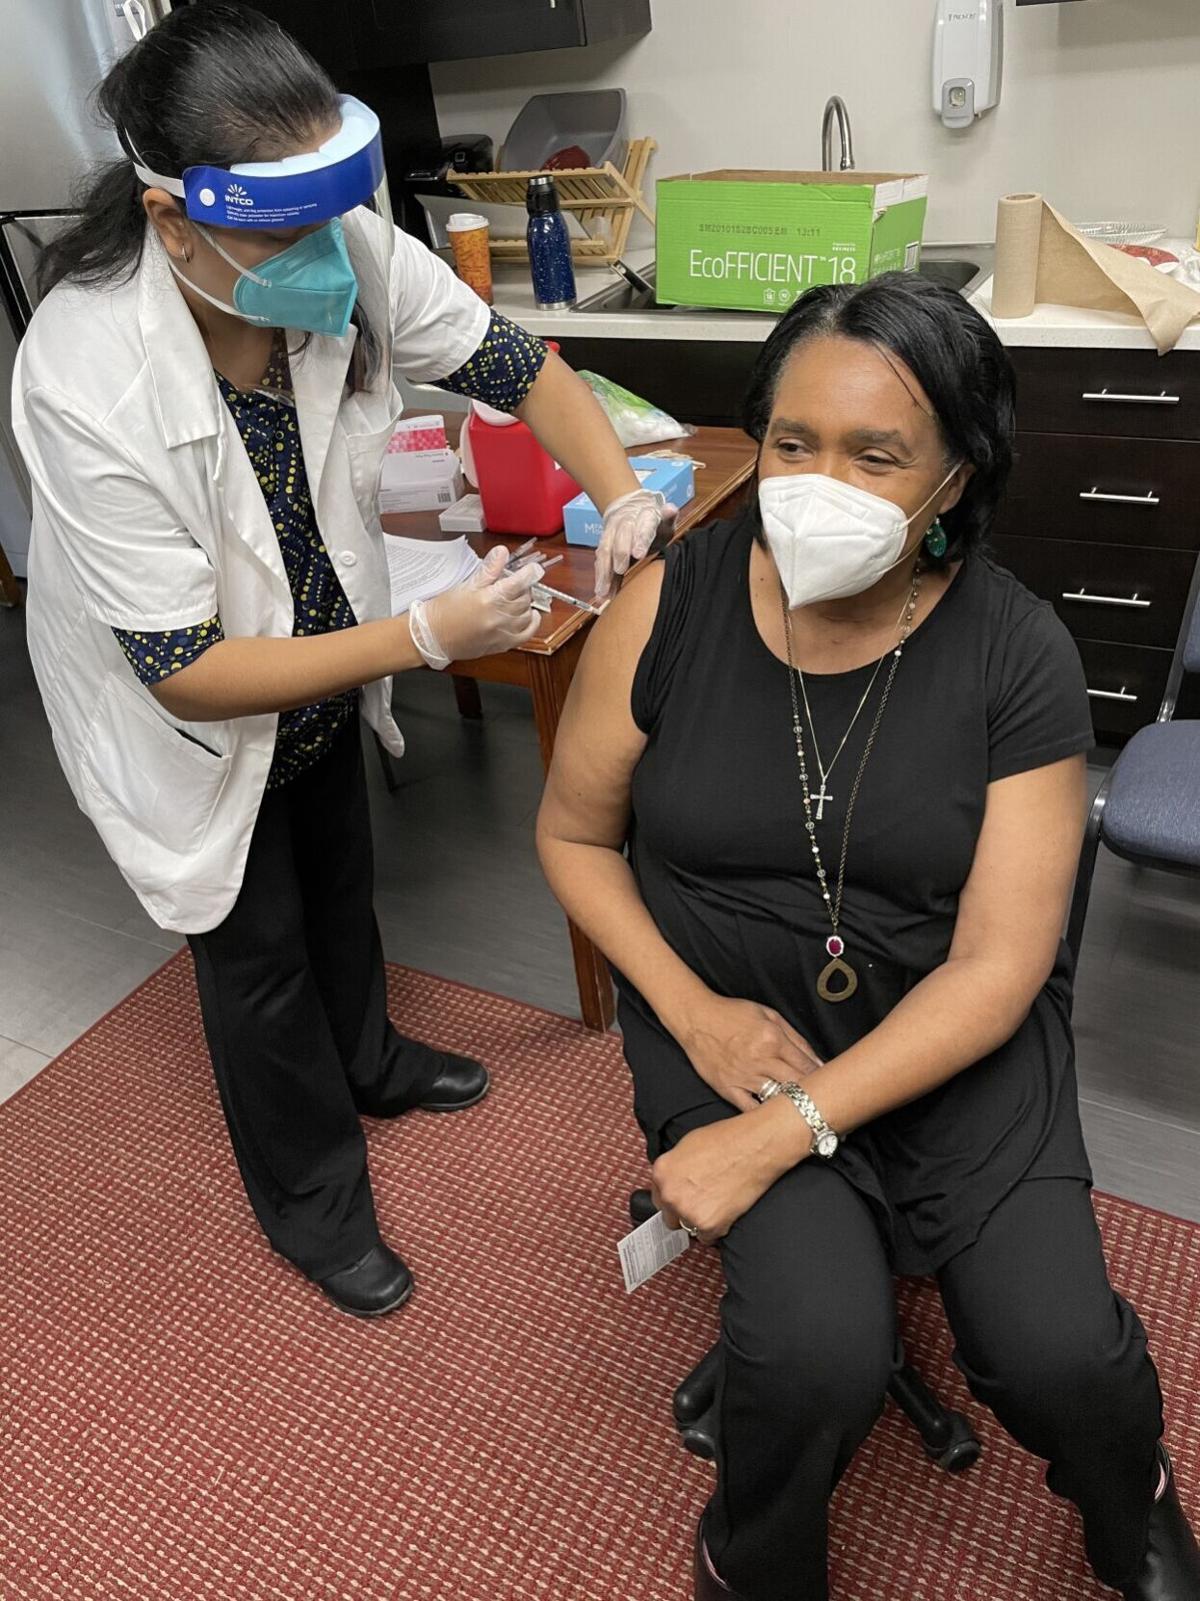 LTCF_Vaccinations_Staff-member-Annette-Dence.jpg